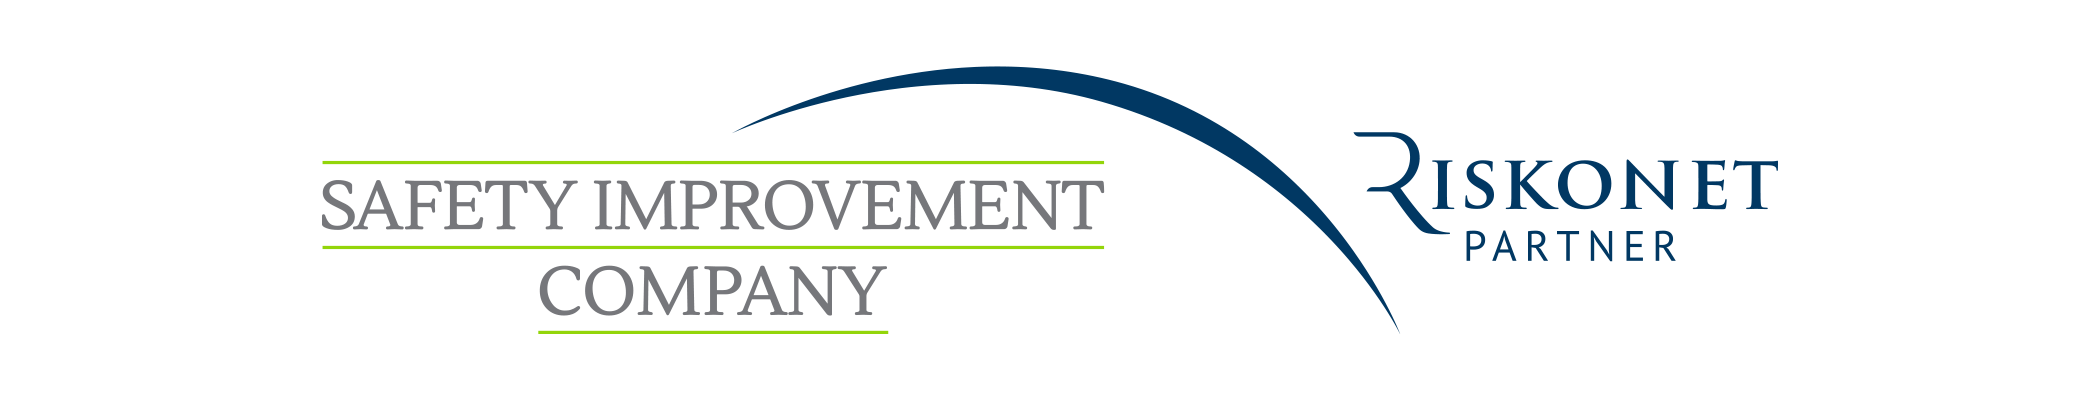 Safety Improvement Company